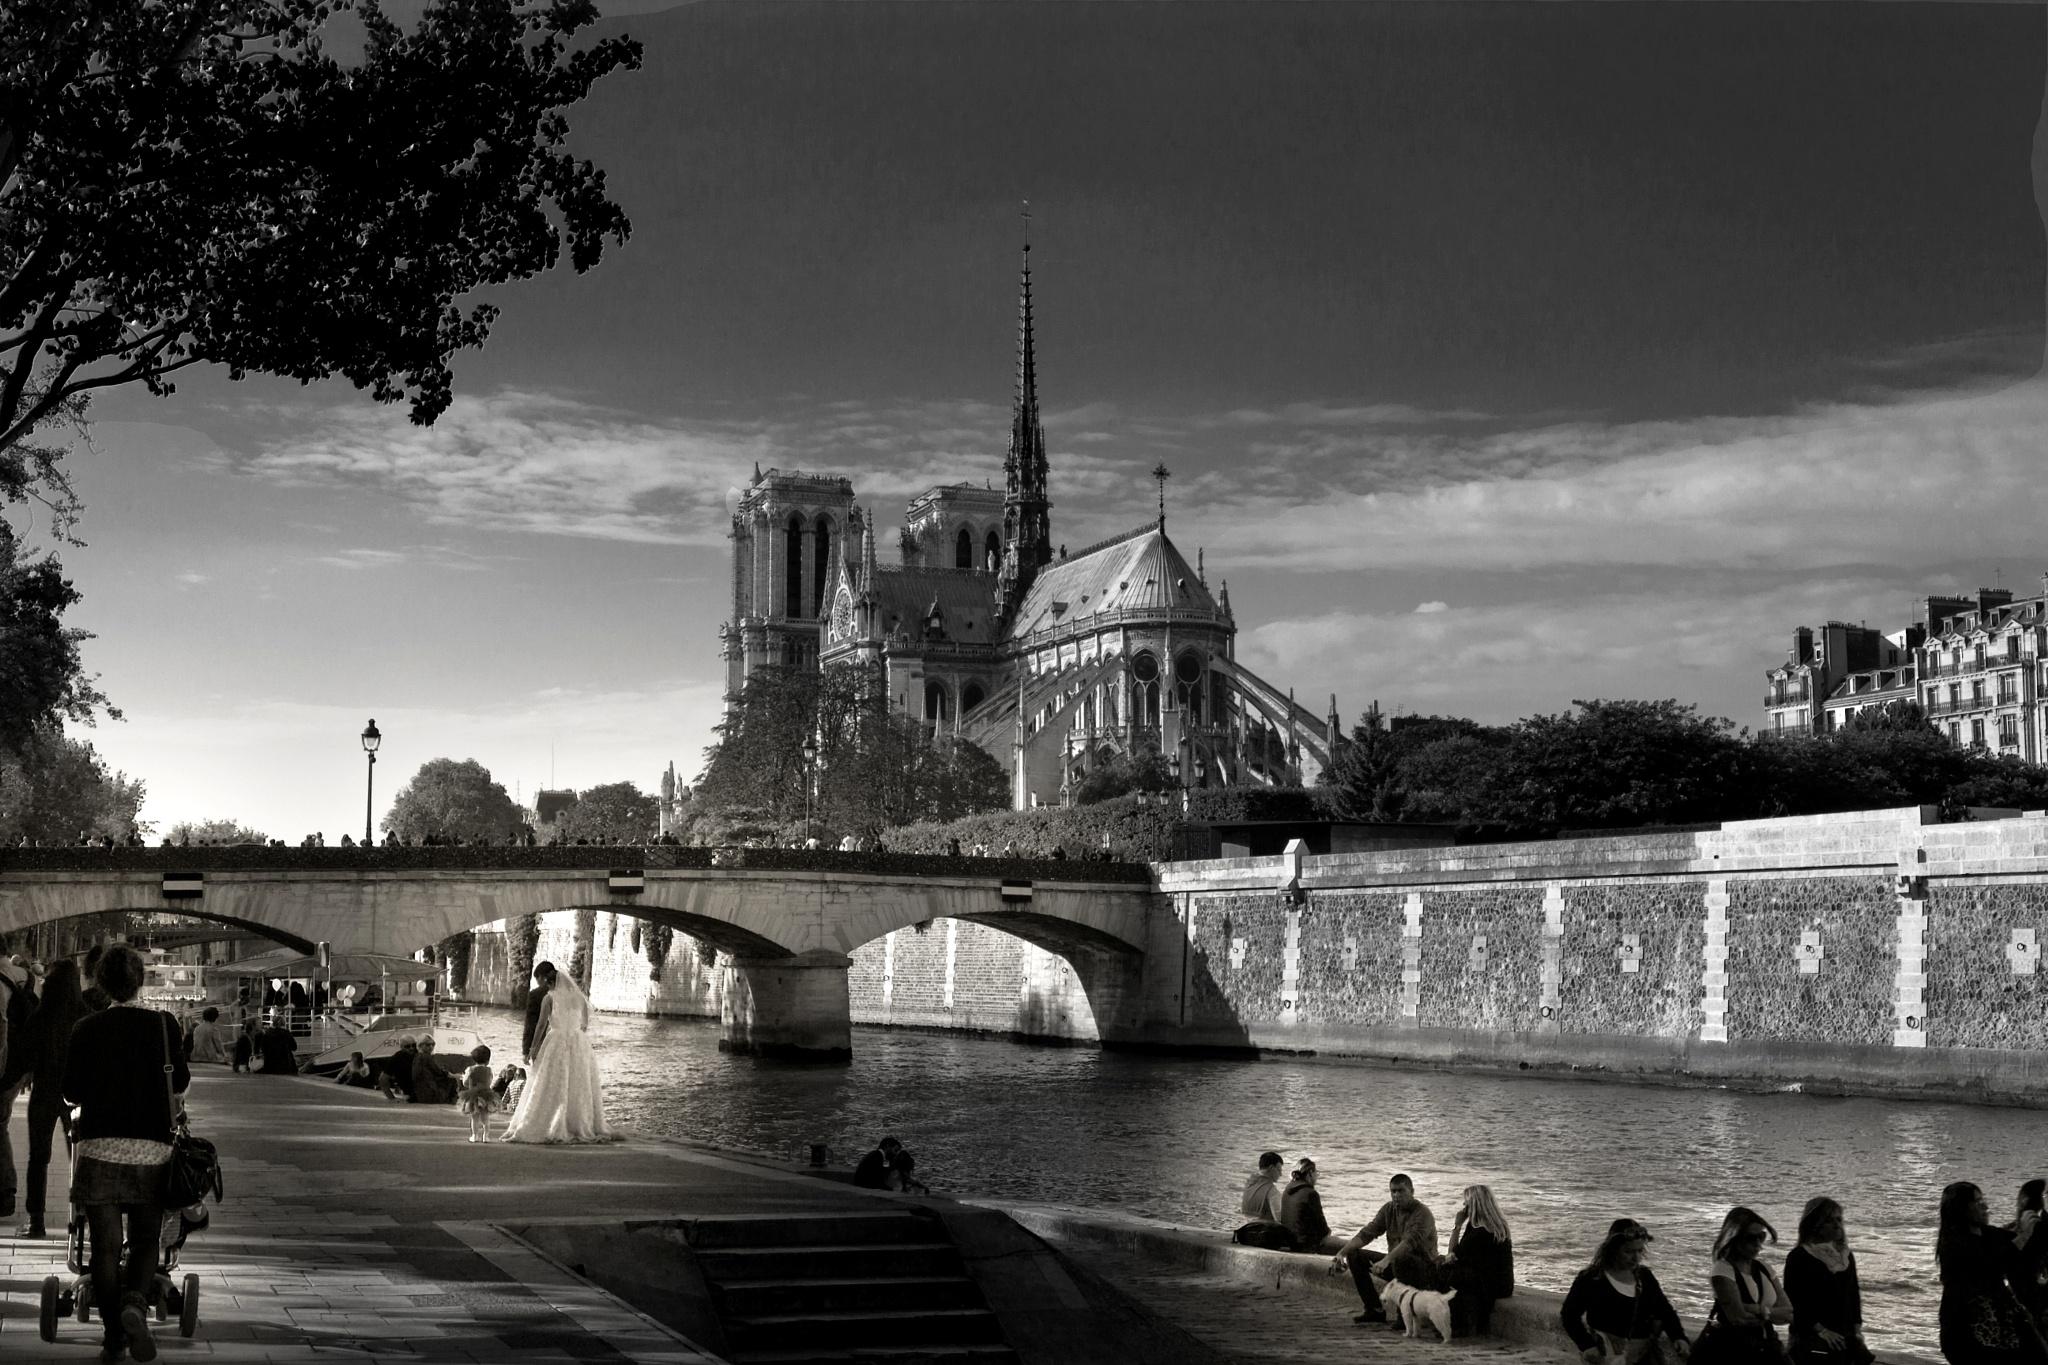 Les quais de Seine et Notre Dame de Paris by RuedeSiam